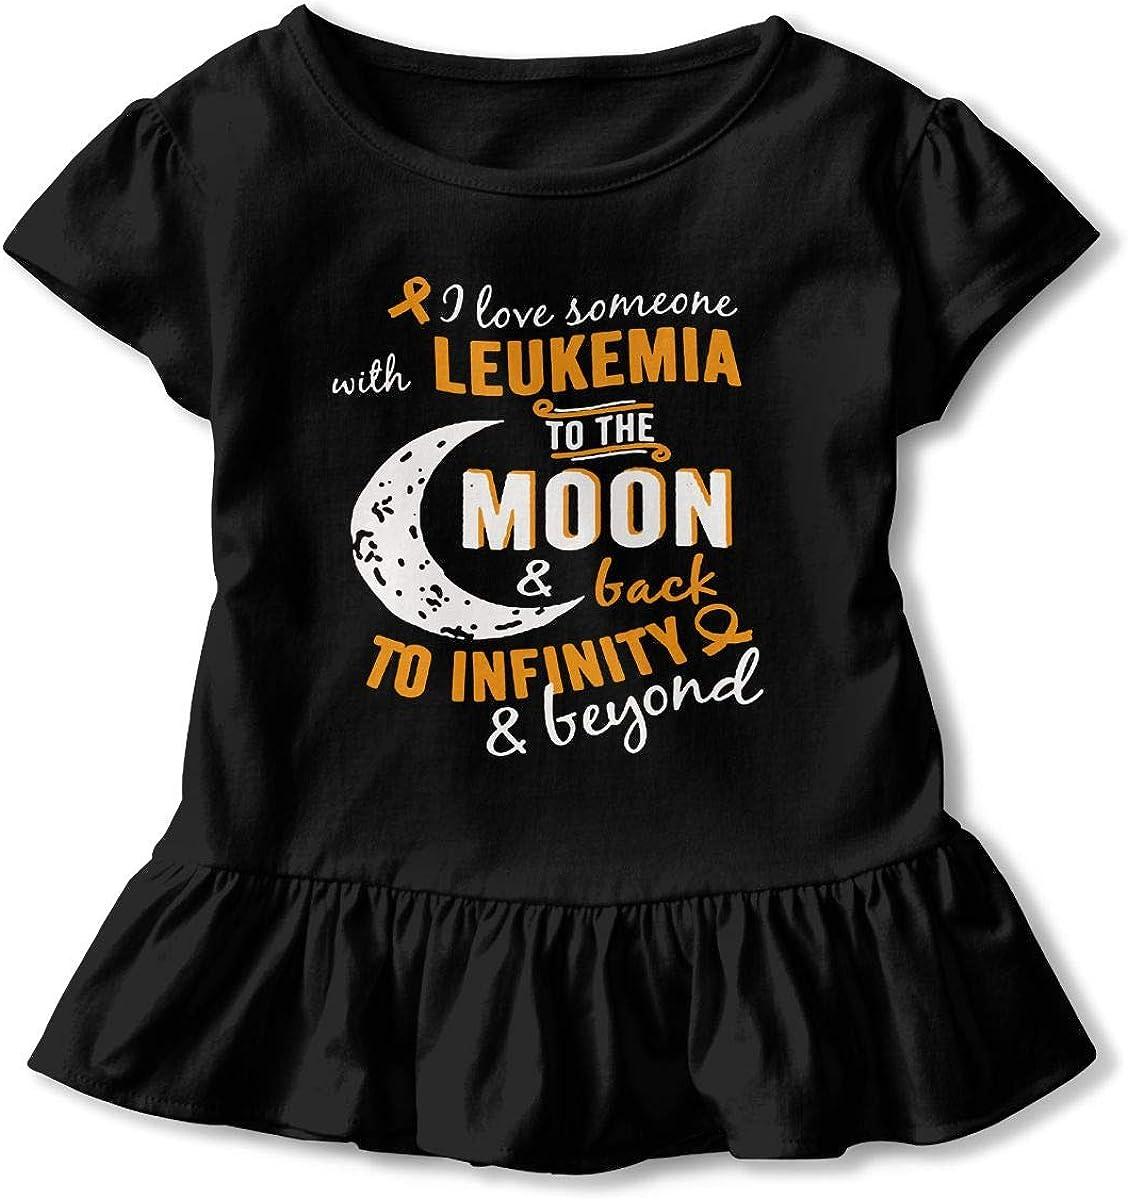 Tuna Fish T-Shirt Kids Girls Short Sleeve Ruffles Shirt T-Shirt for 2-6T